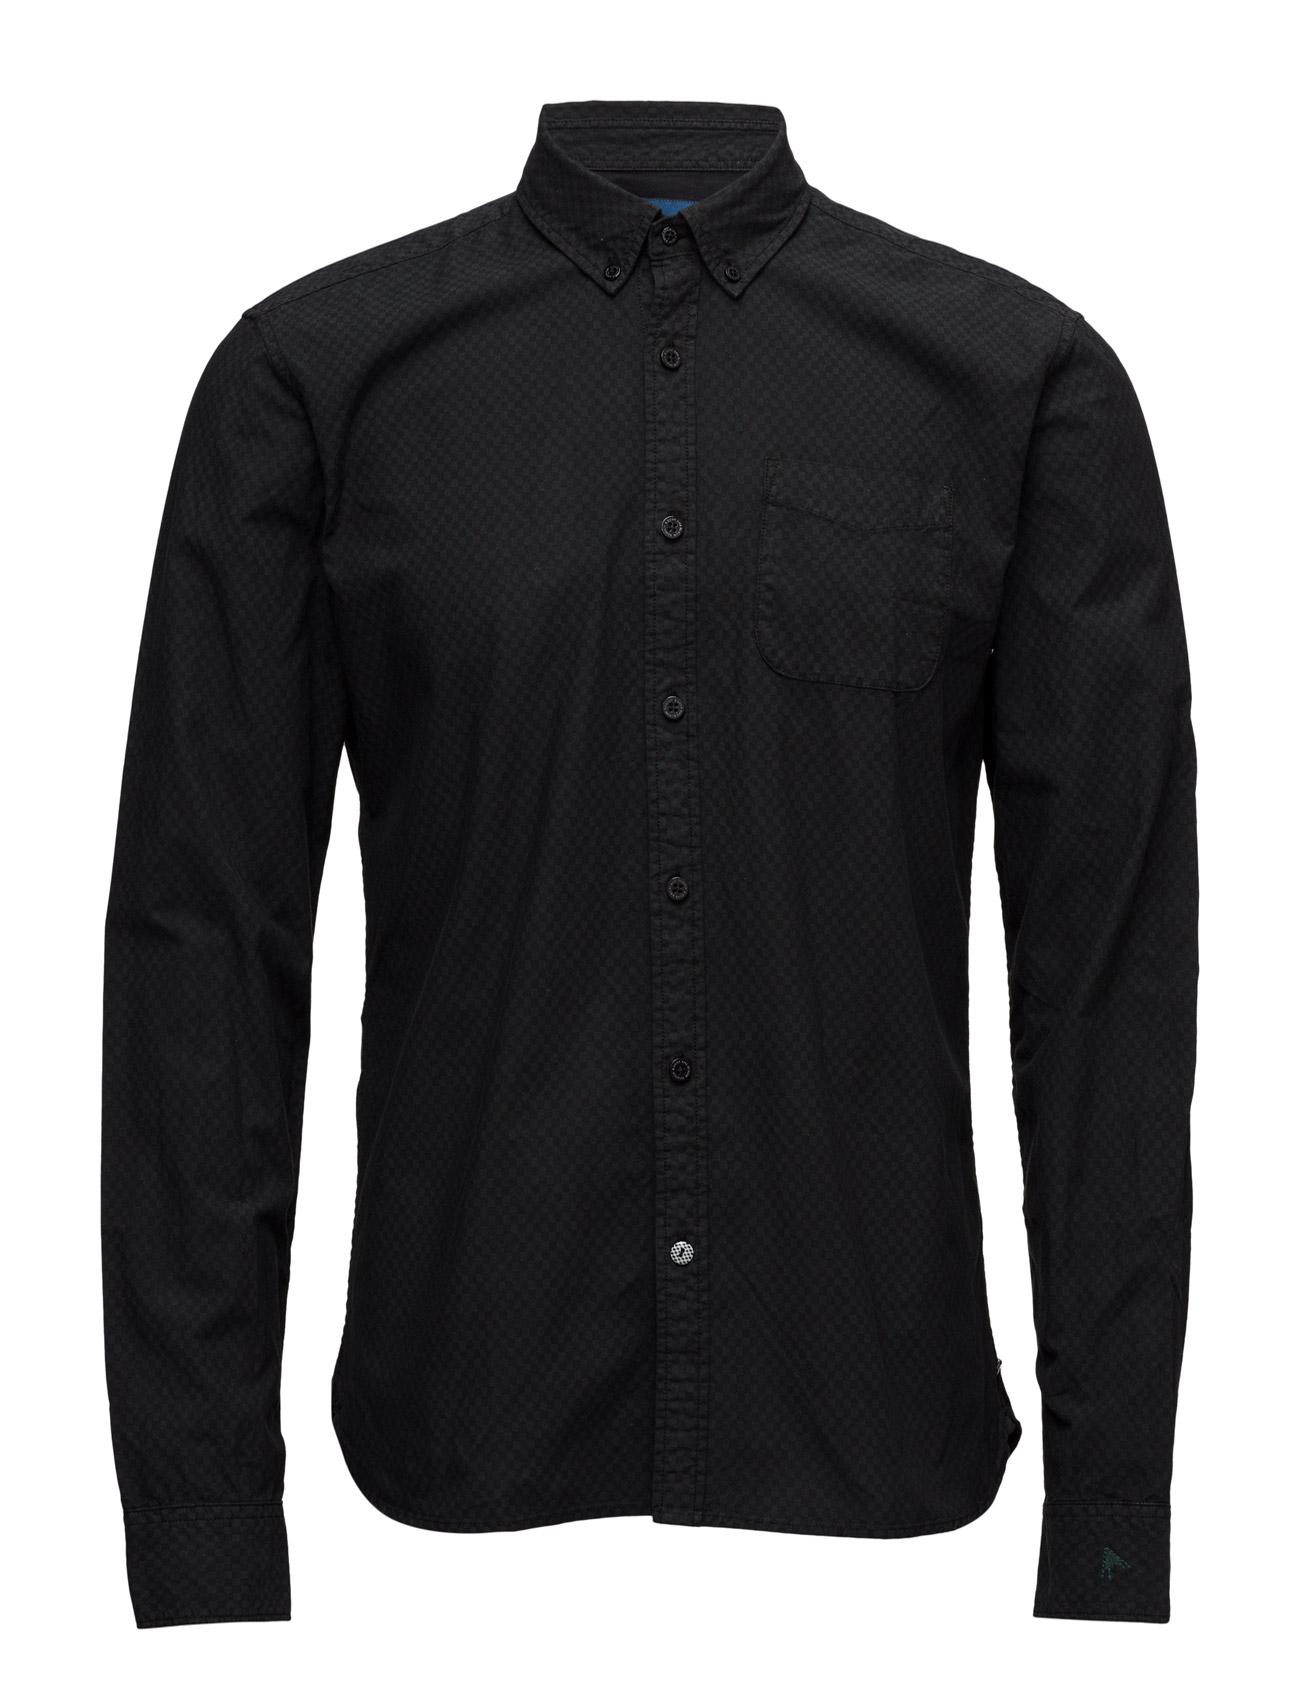 Allover Printed 1 Pocket Shirt Scotch & Soda Casual sko til Herrer i